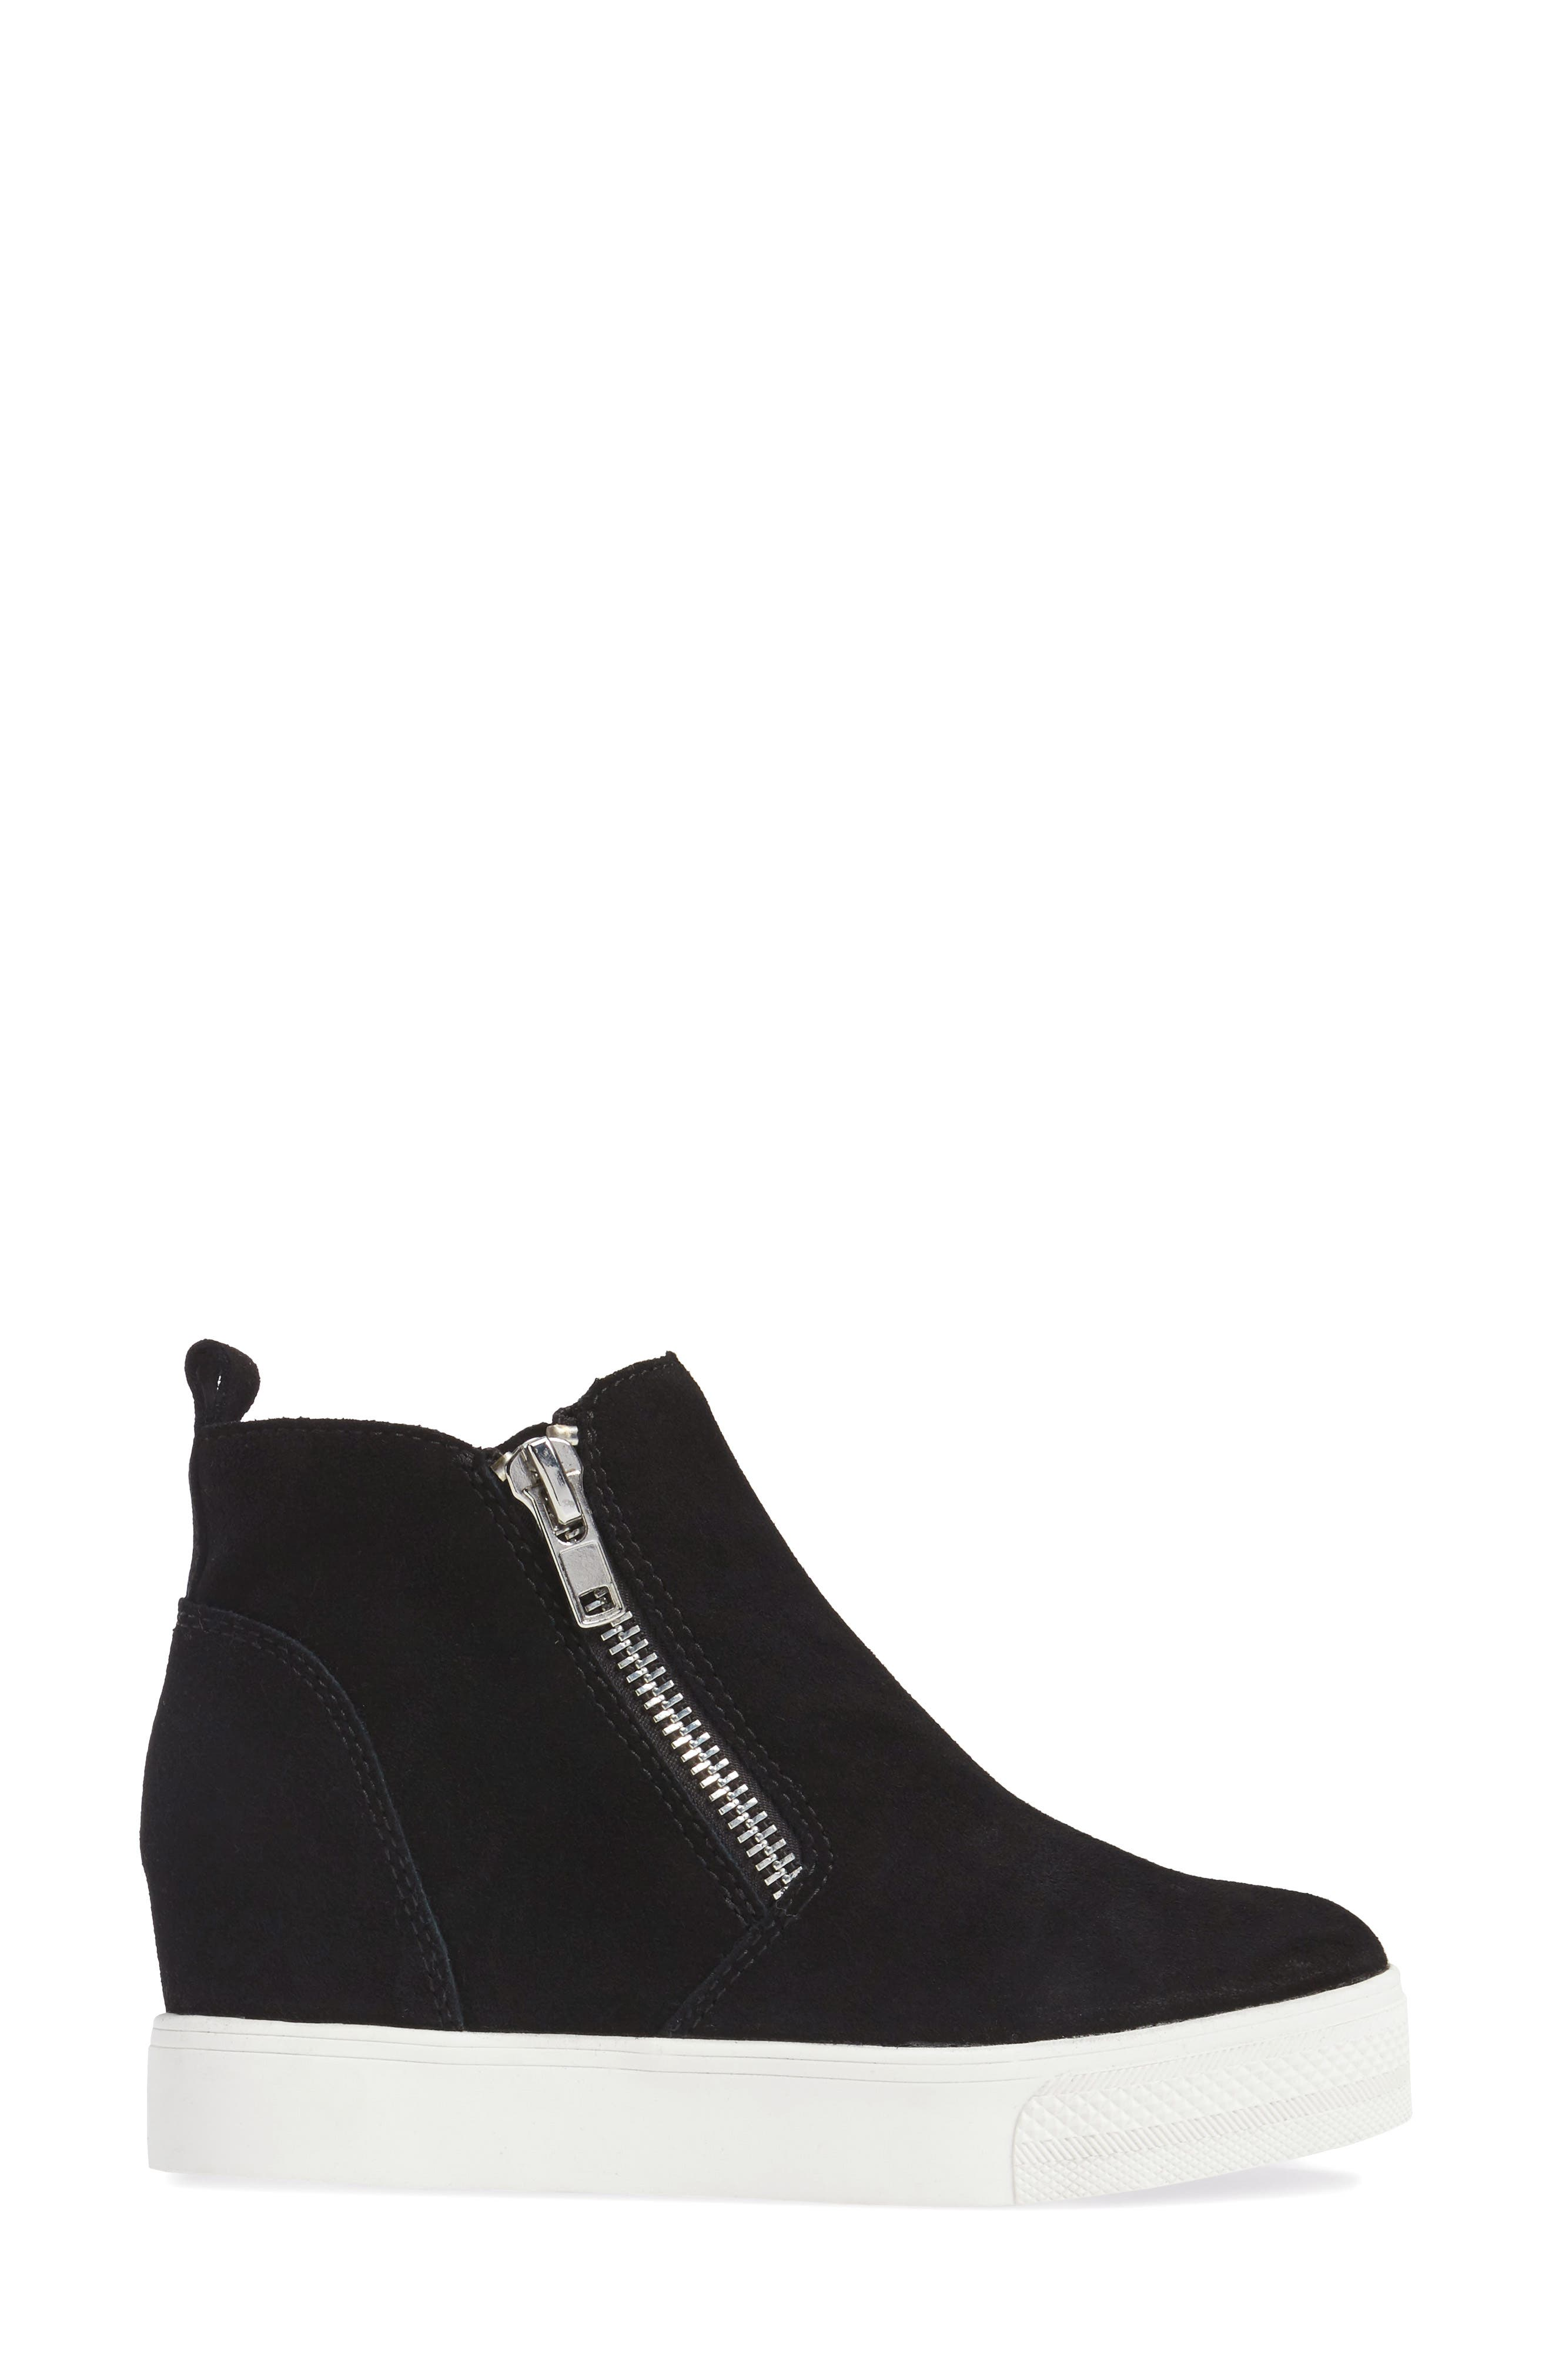 Alternate Image 3  - Steve Madden Wedgie High Top Platform Sneaker (Women)